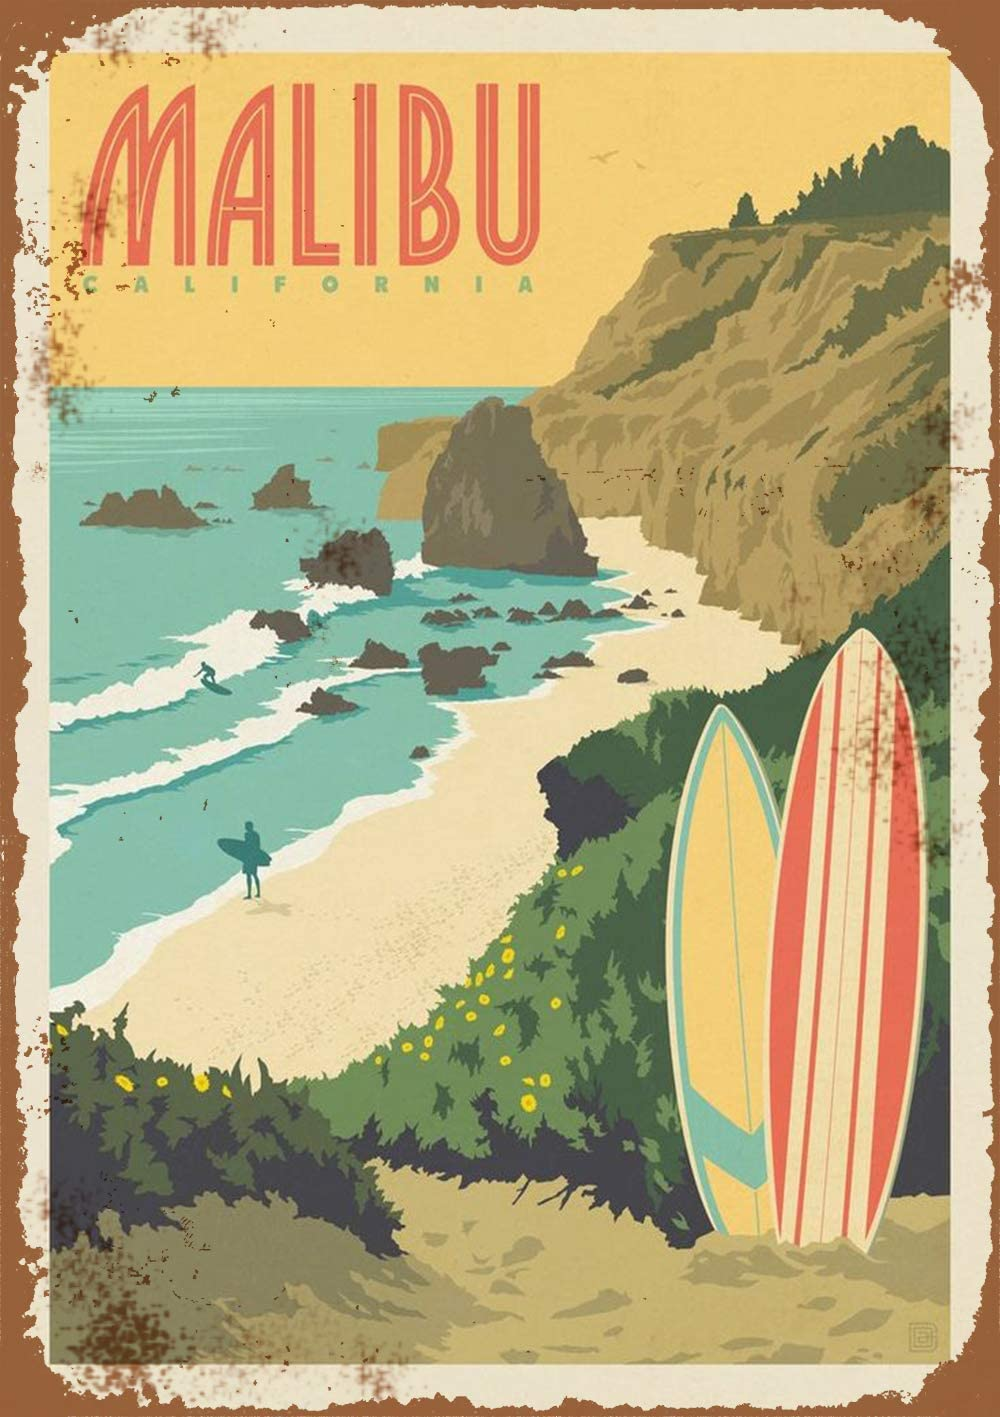 "PAGAIXI Wall Decor Farm Bar Art Decorations Home Pub Metal Sign 16"" x 12"" Tin Signs Malibu Beach Vintage,for & Garageation"